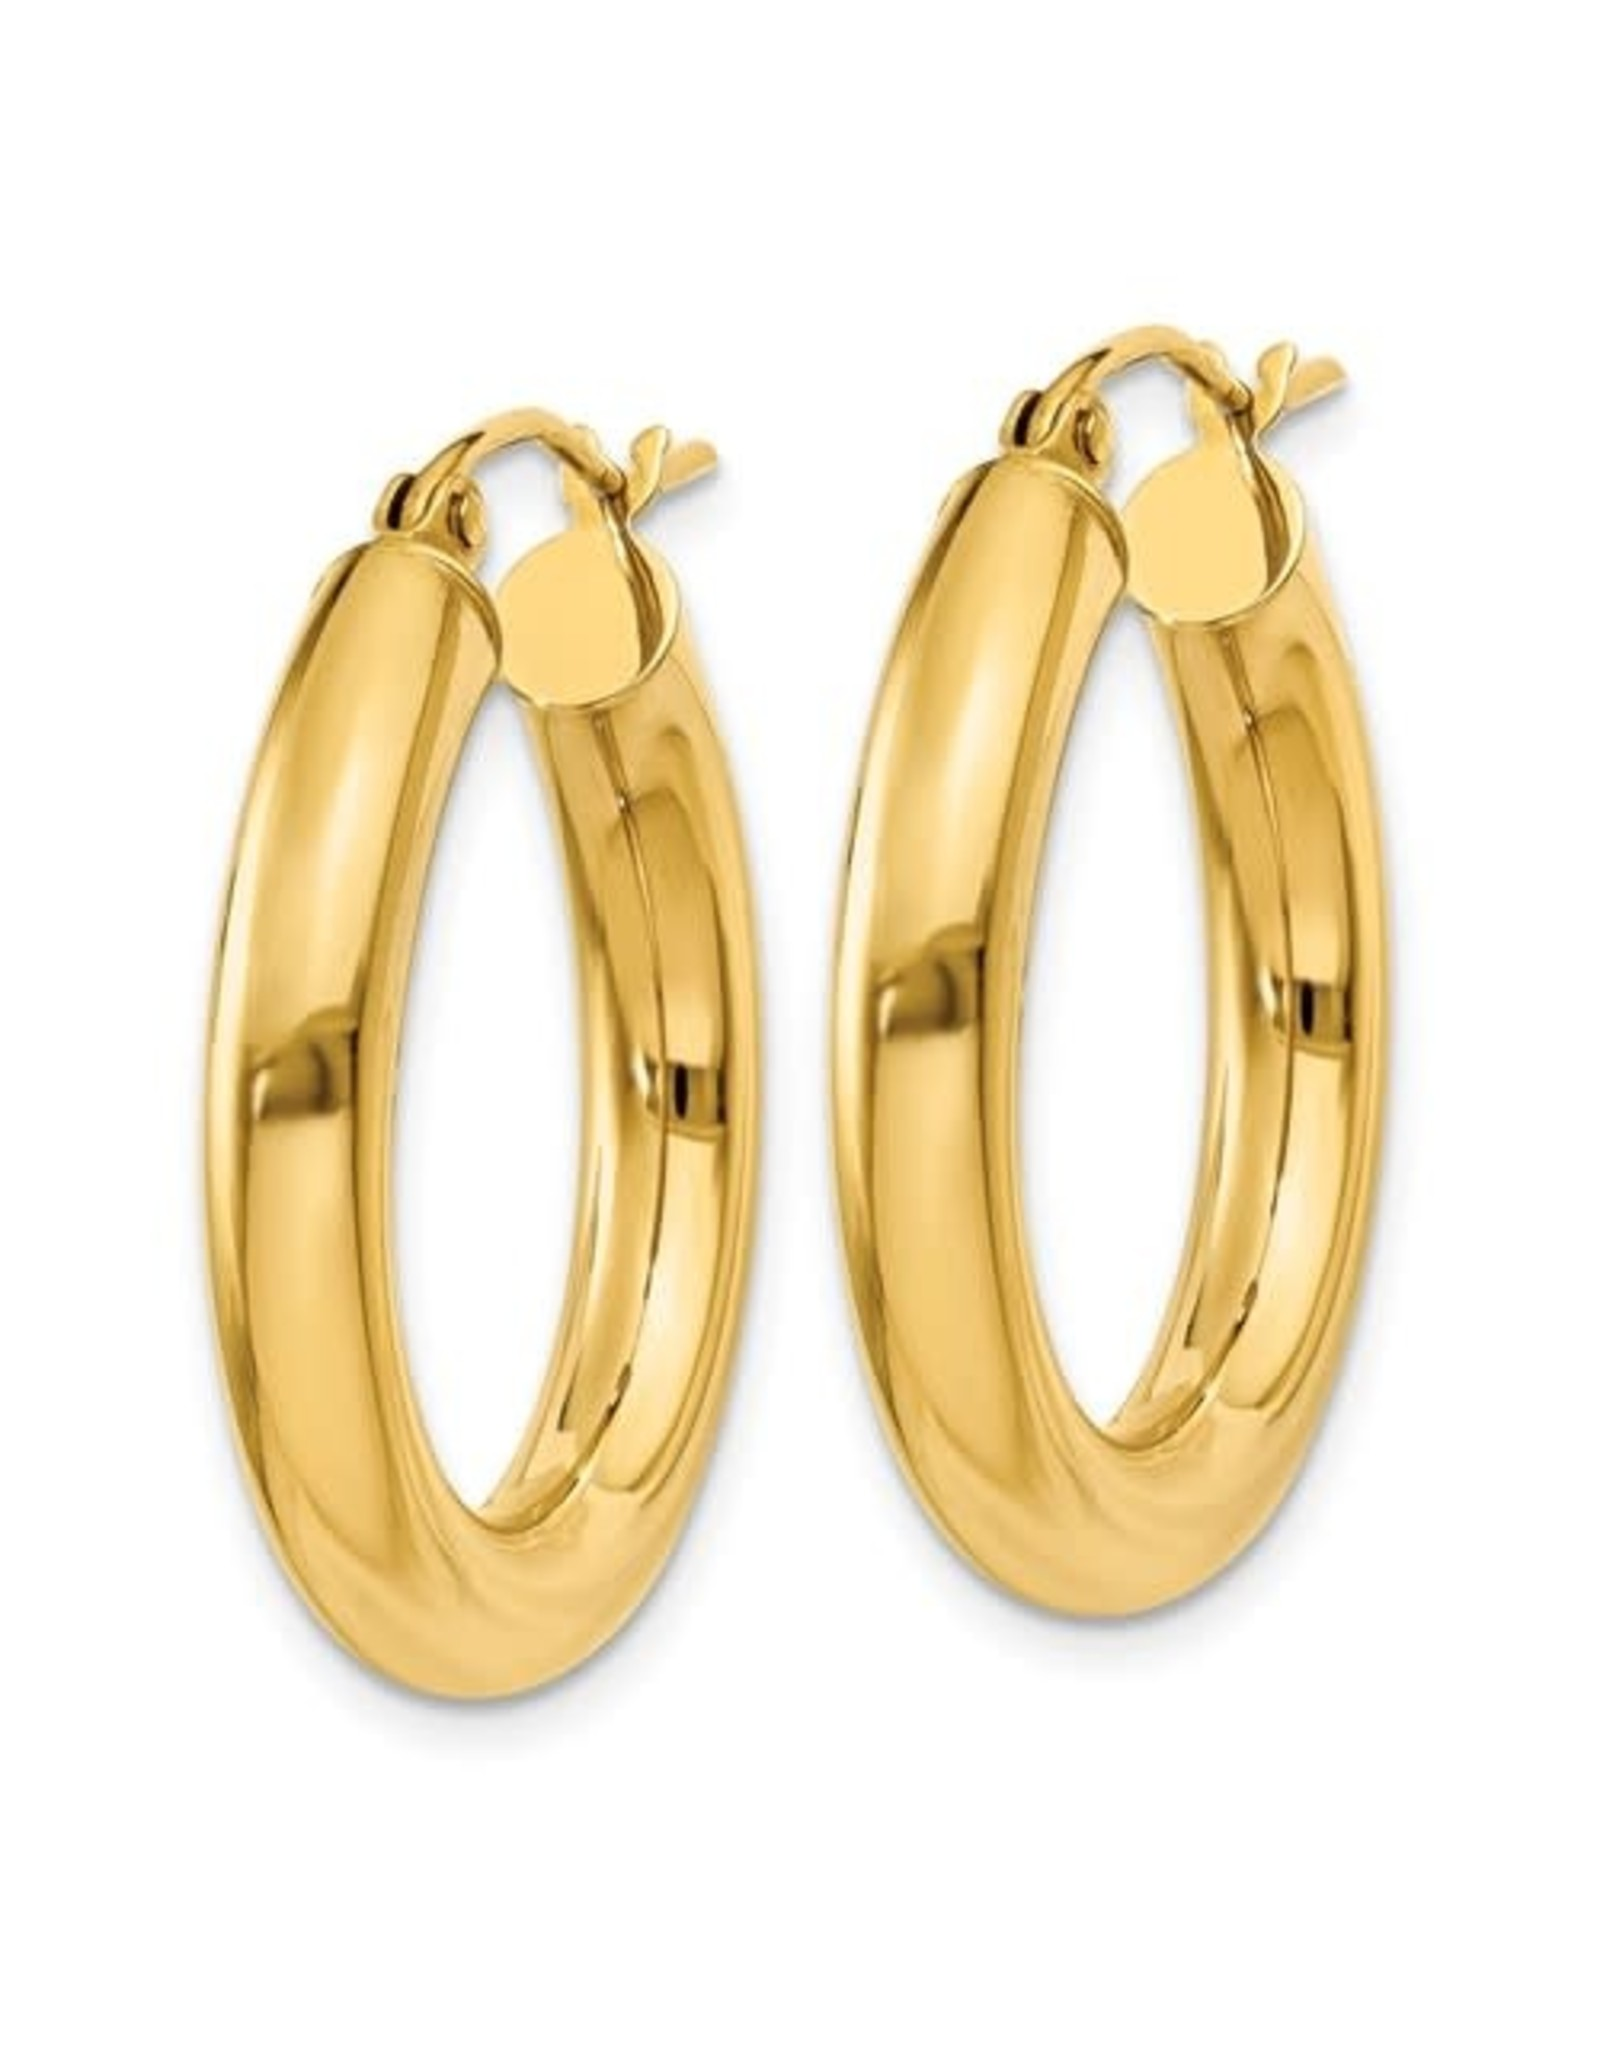 "14K 4mm Lightweight Classic Tube Hoop Earrings, 1"", 1.85dwts"